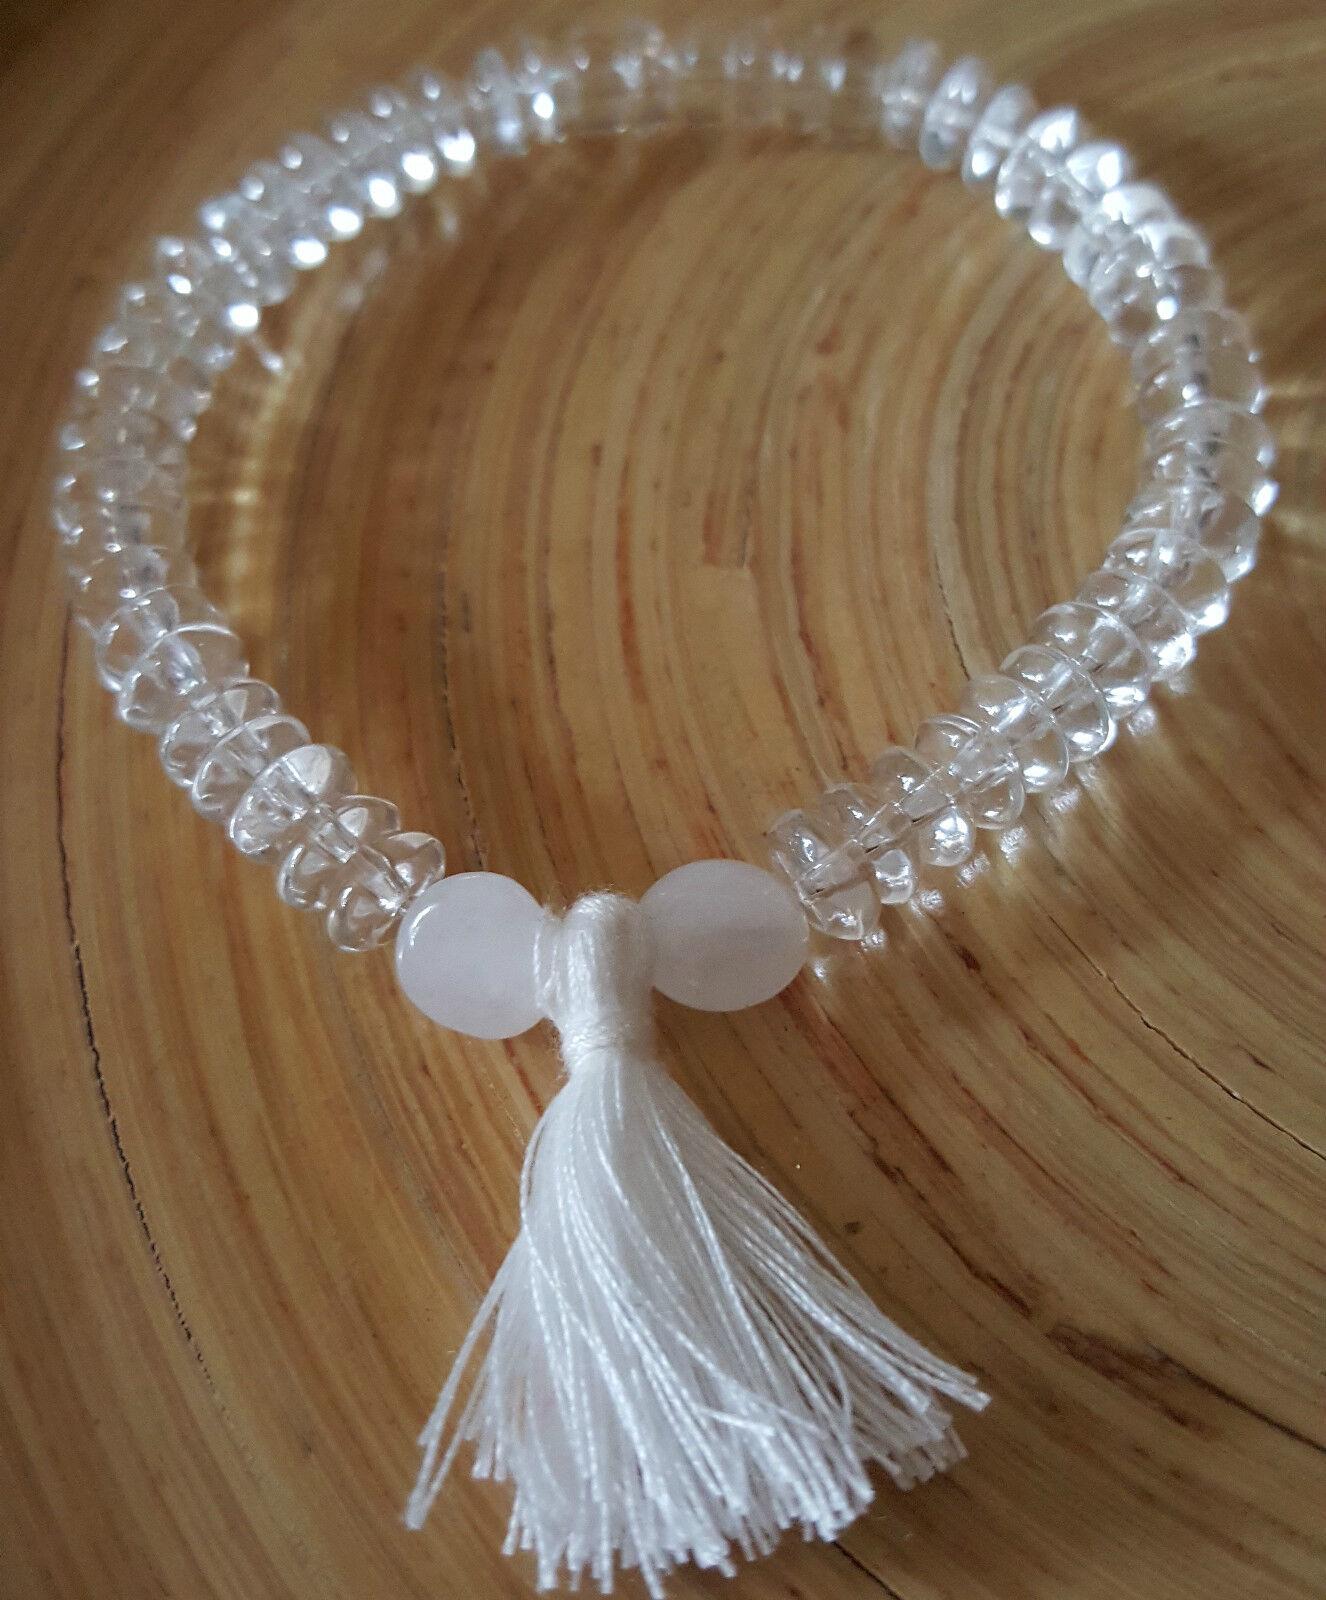 Russian Natrolite High Vibration Himalayan Water Crystal Quartz Tassel Bracelet